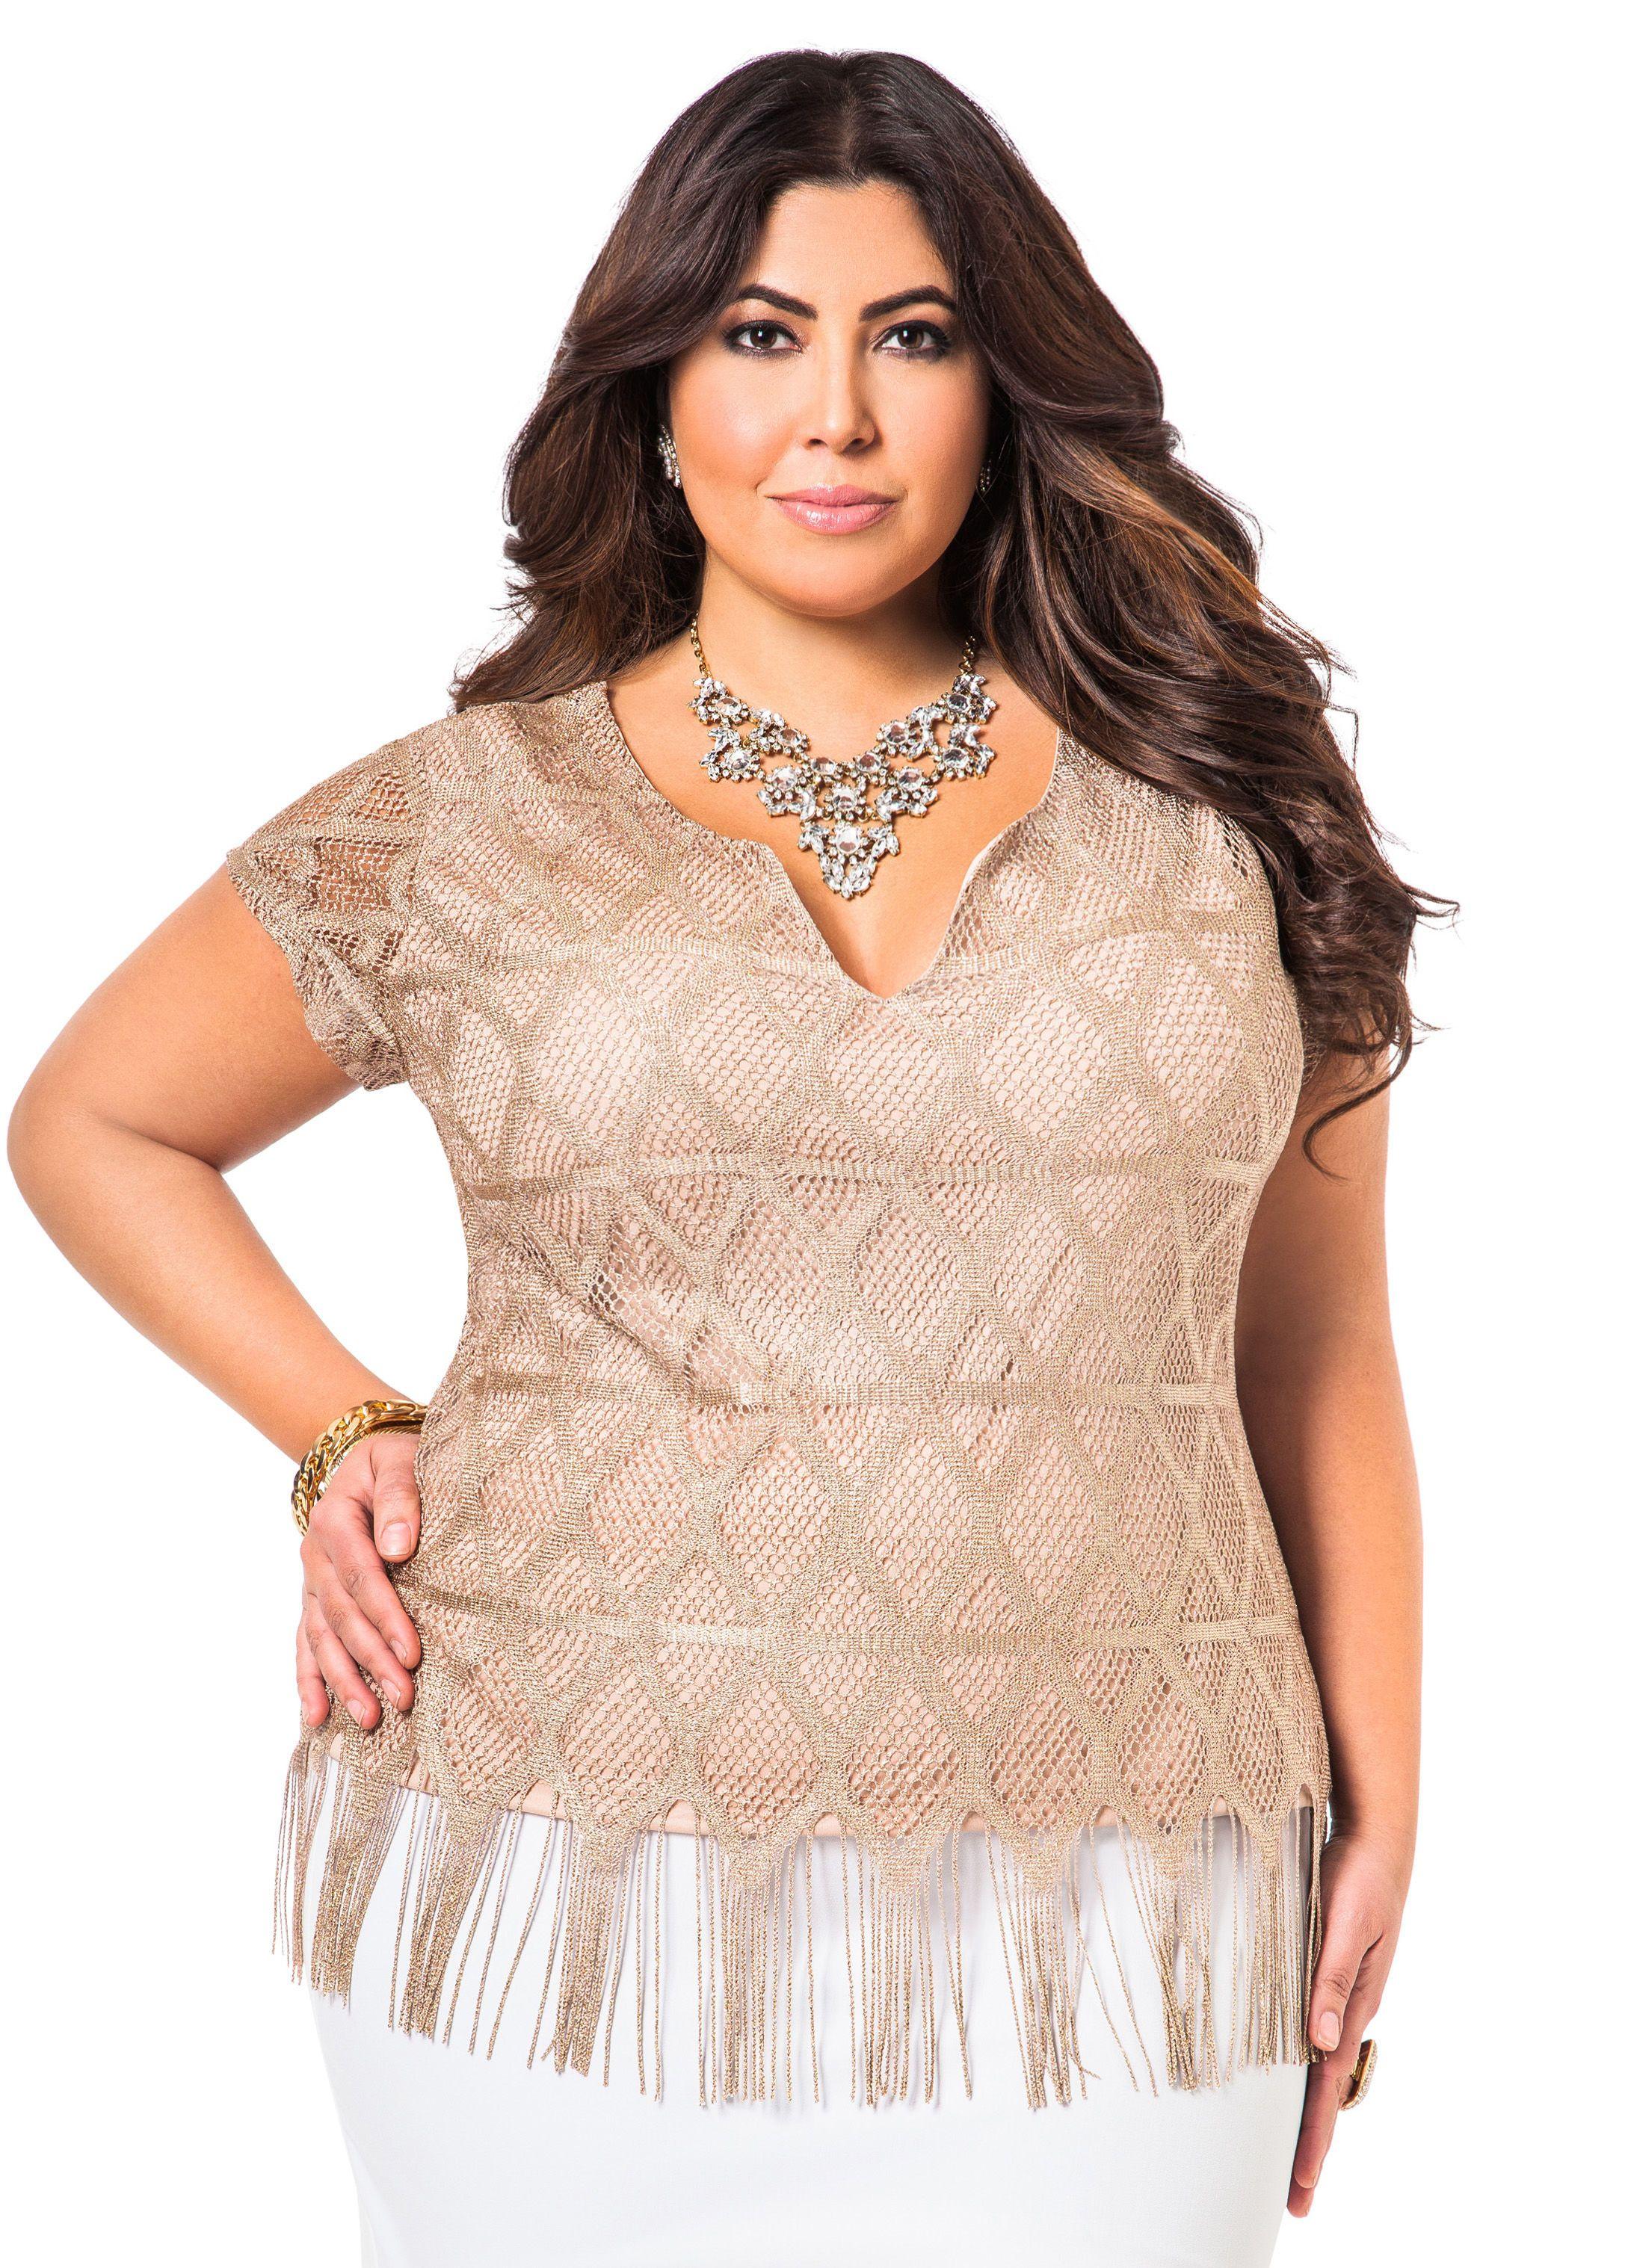 a38e06ba595d Scalloped Crochet Top - Ashley Stewart   Jessica Milagros   Fashion ...